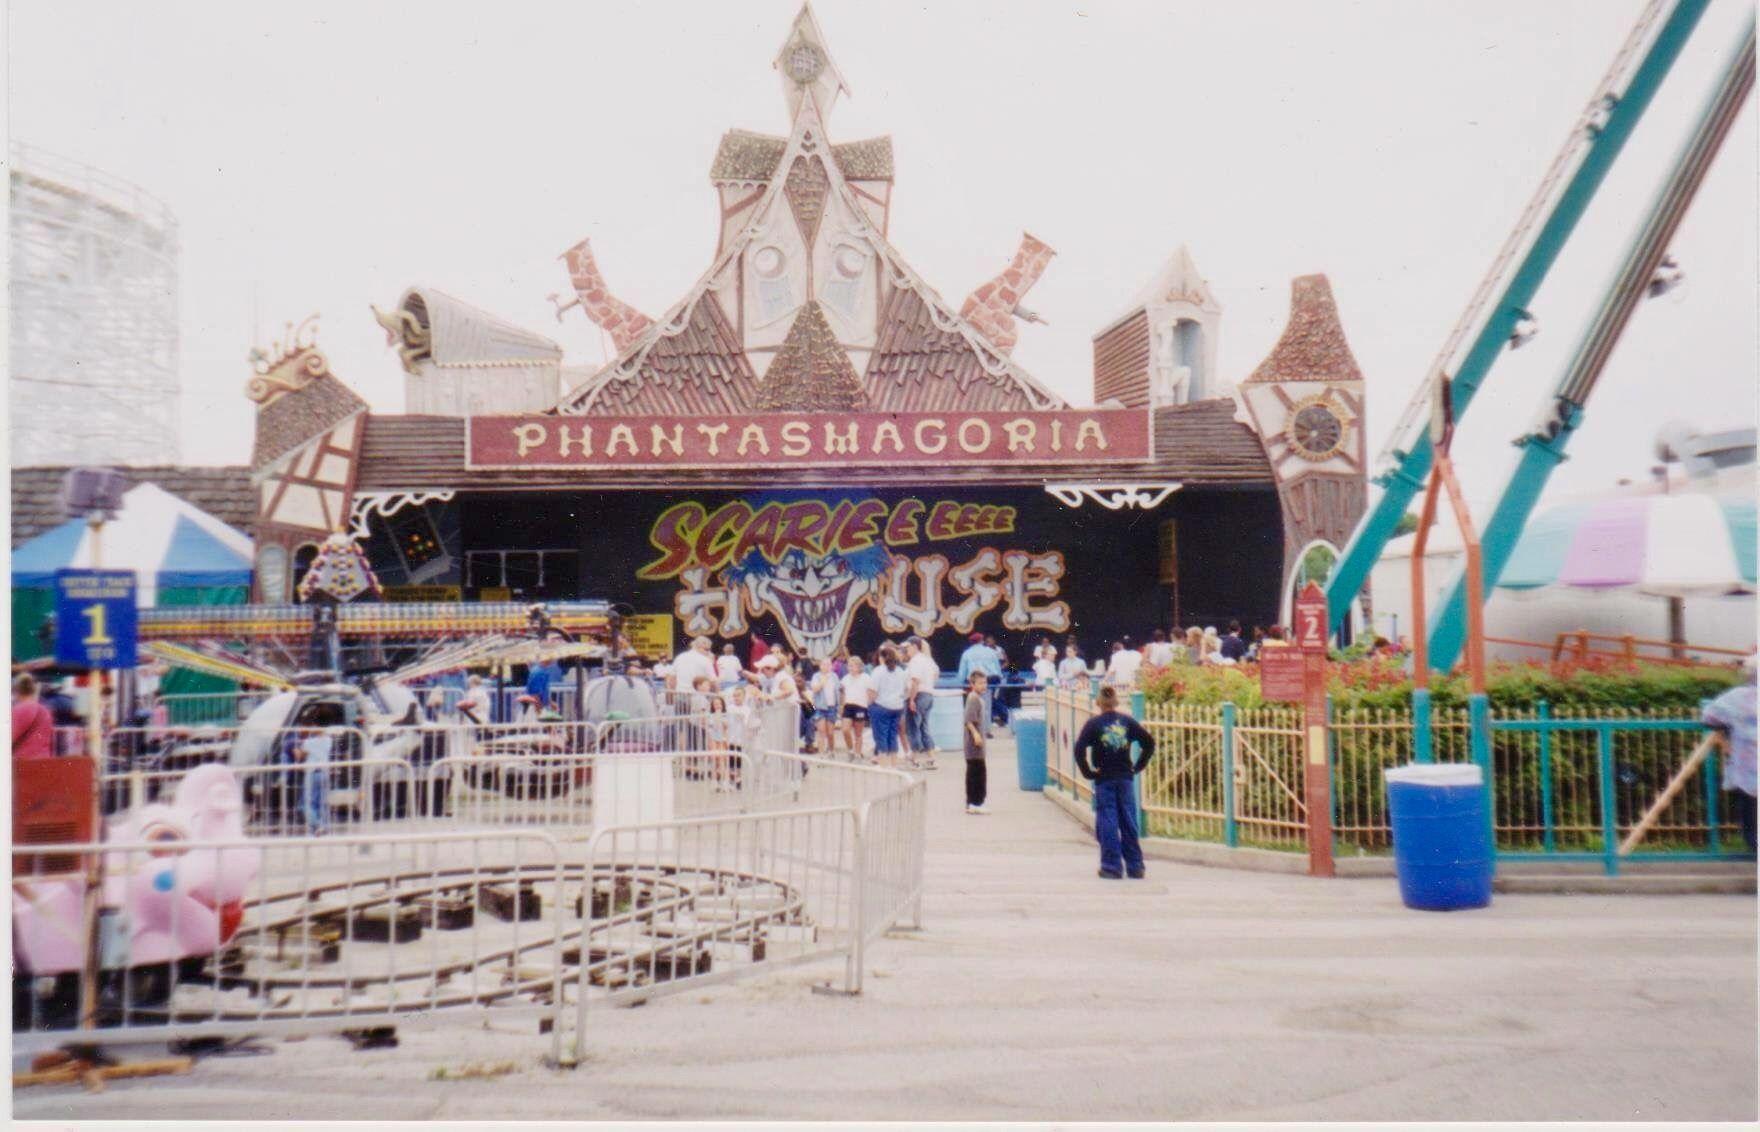 The Phantasmagoria Was A Big Attraction At Bell S Amusement Park